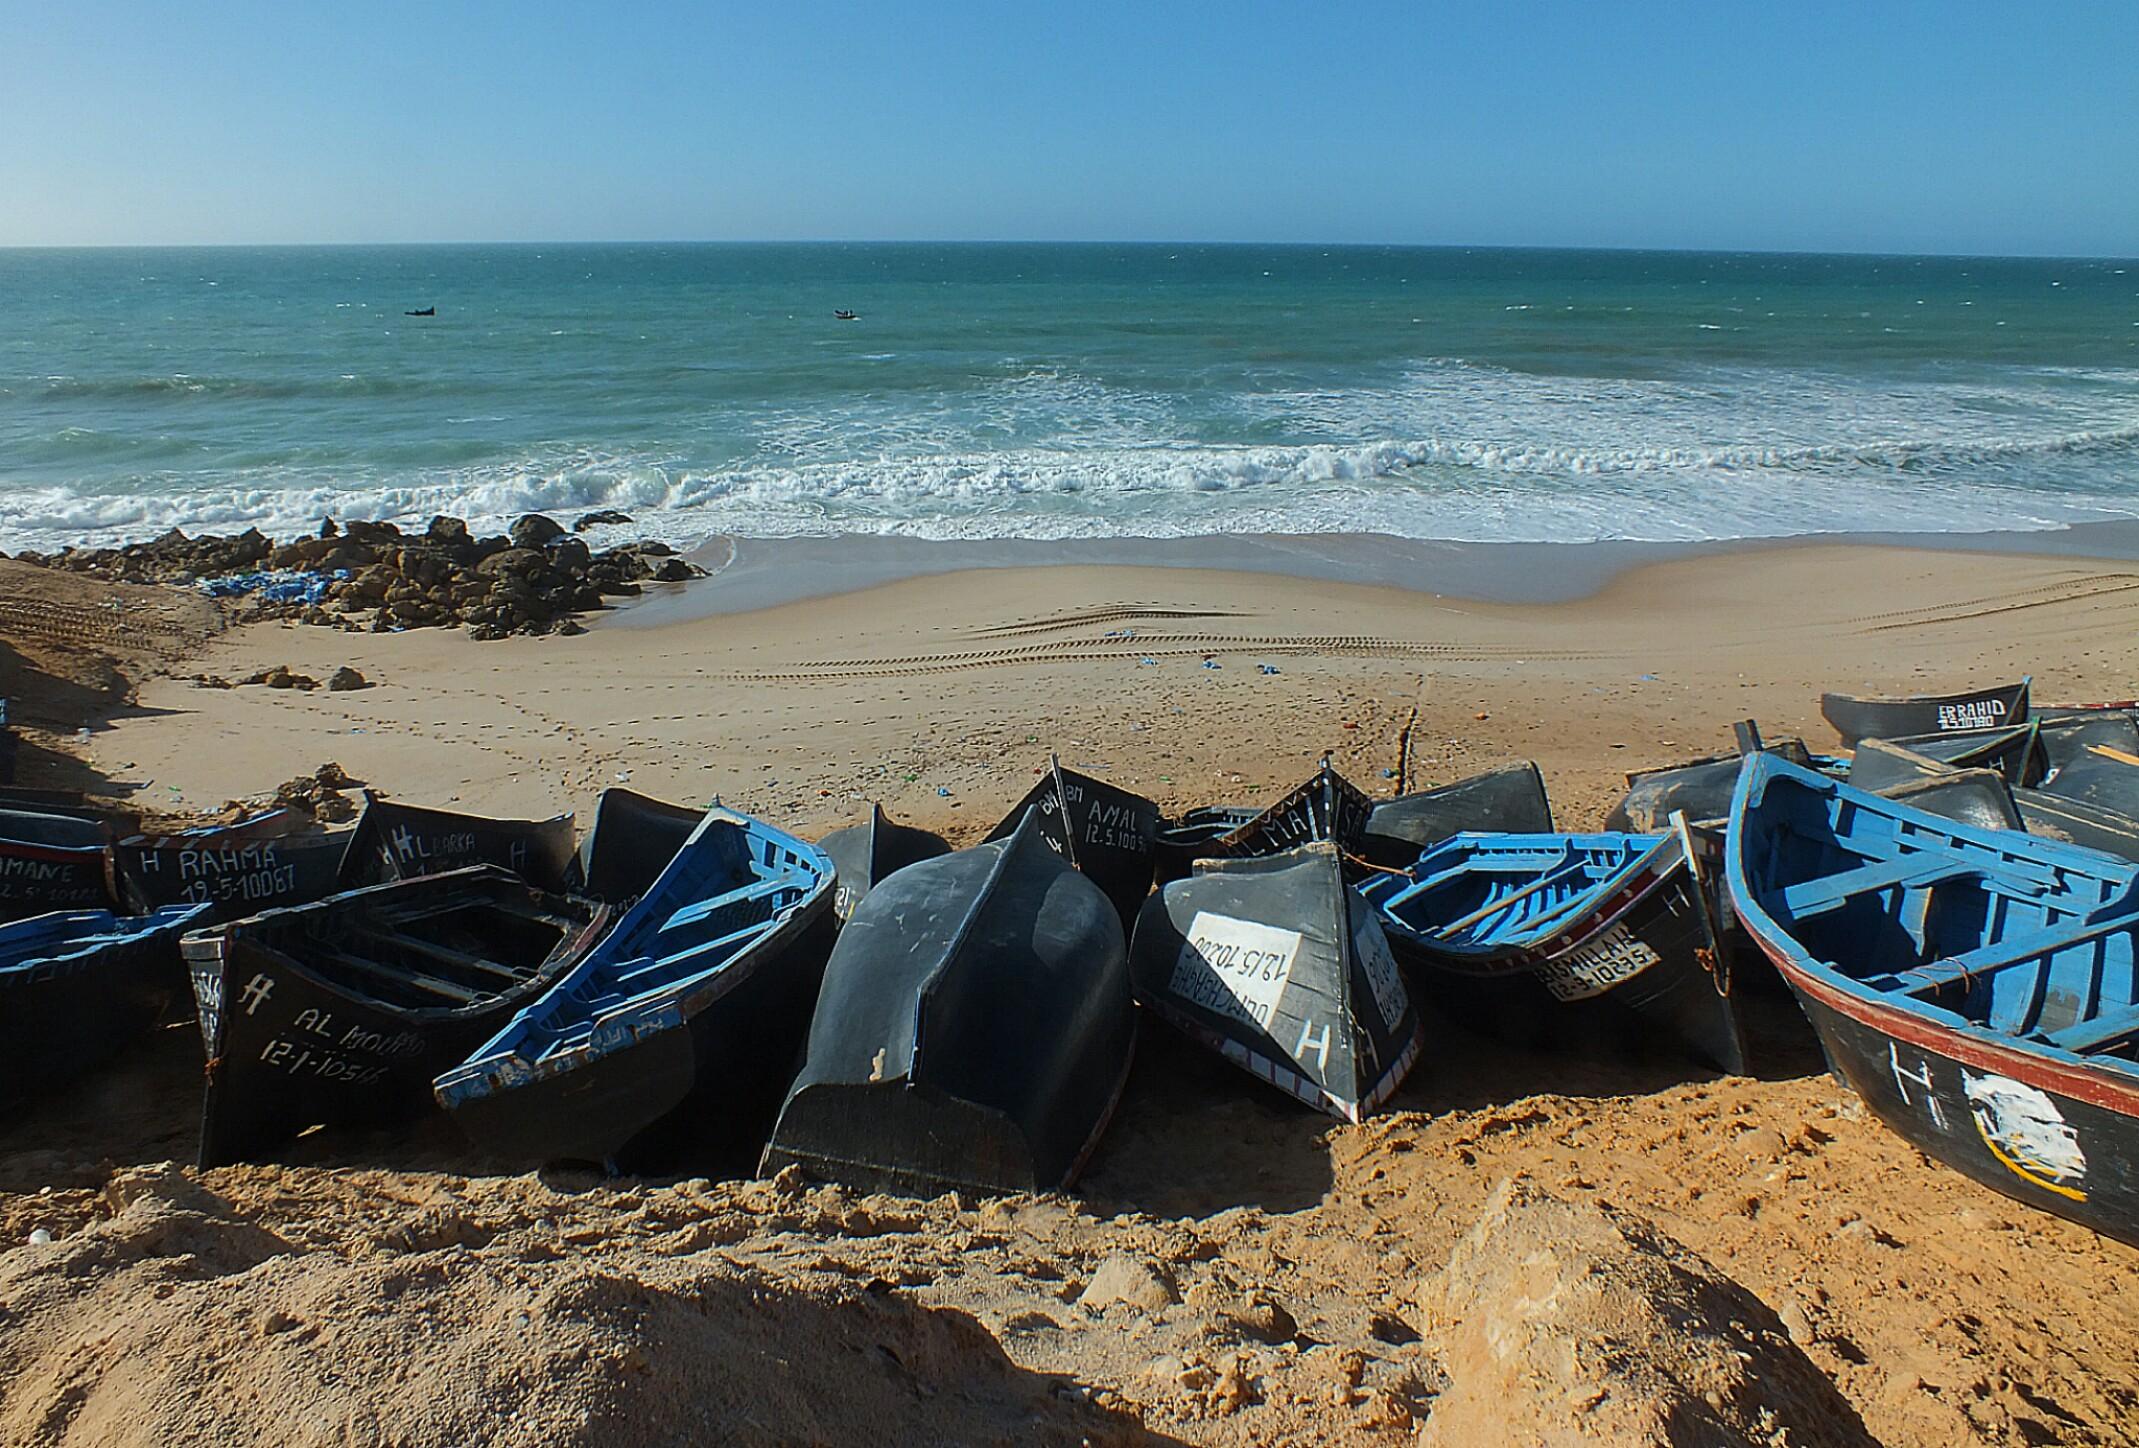 Maroko.Wioska rybacka.Ocean Atlantycki